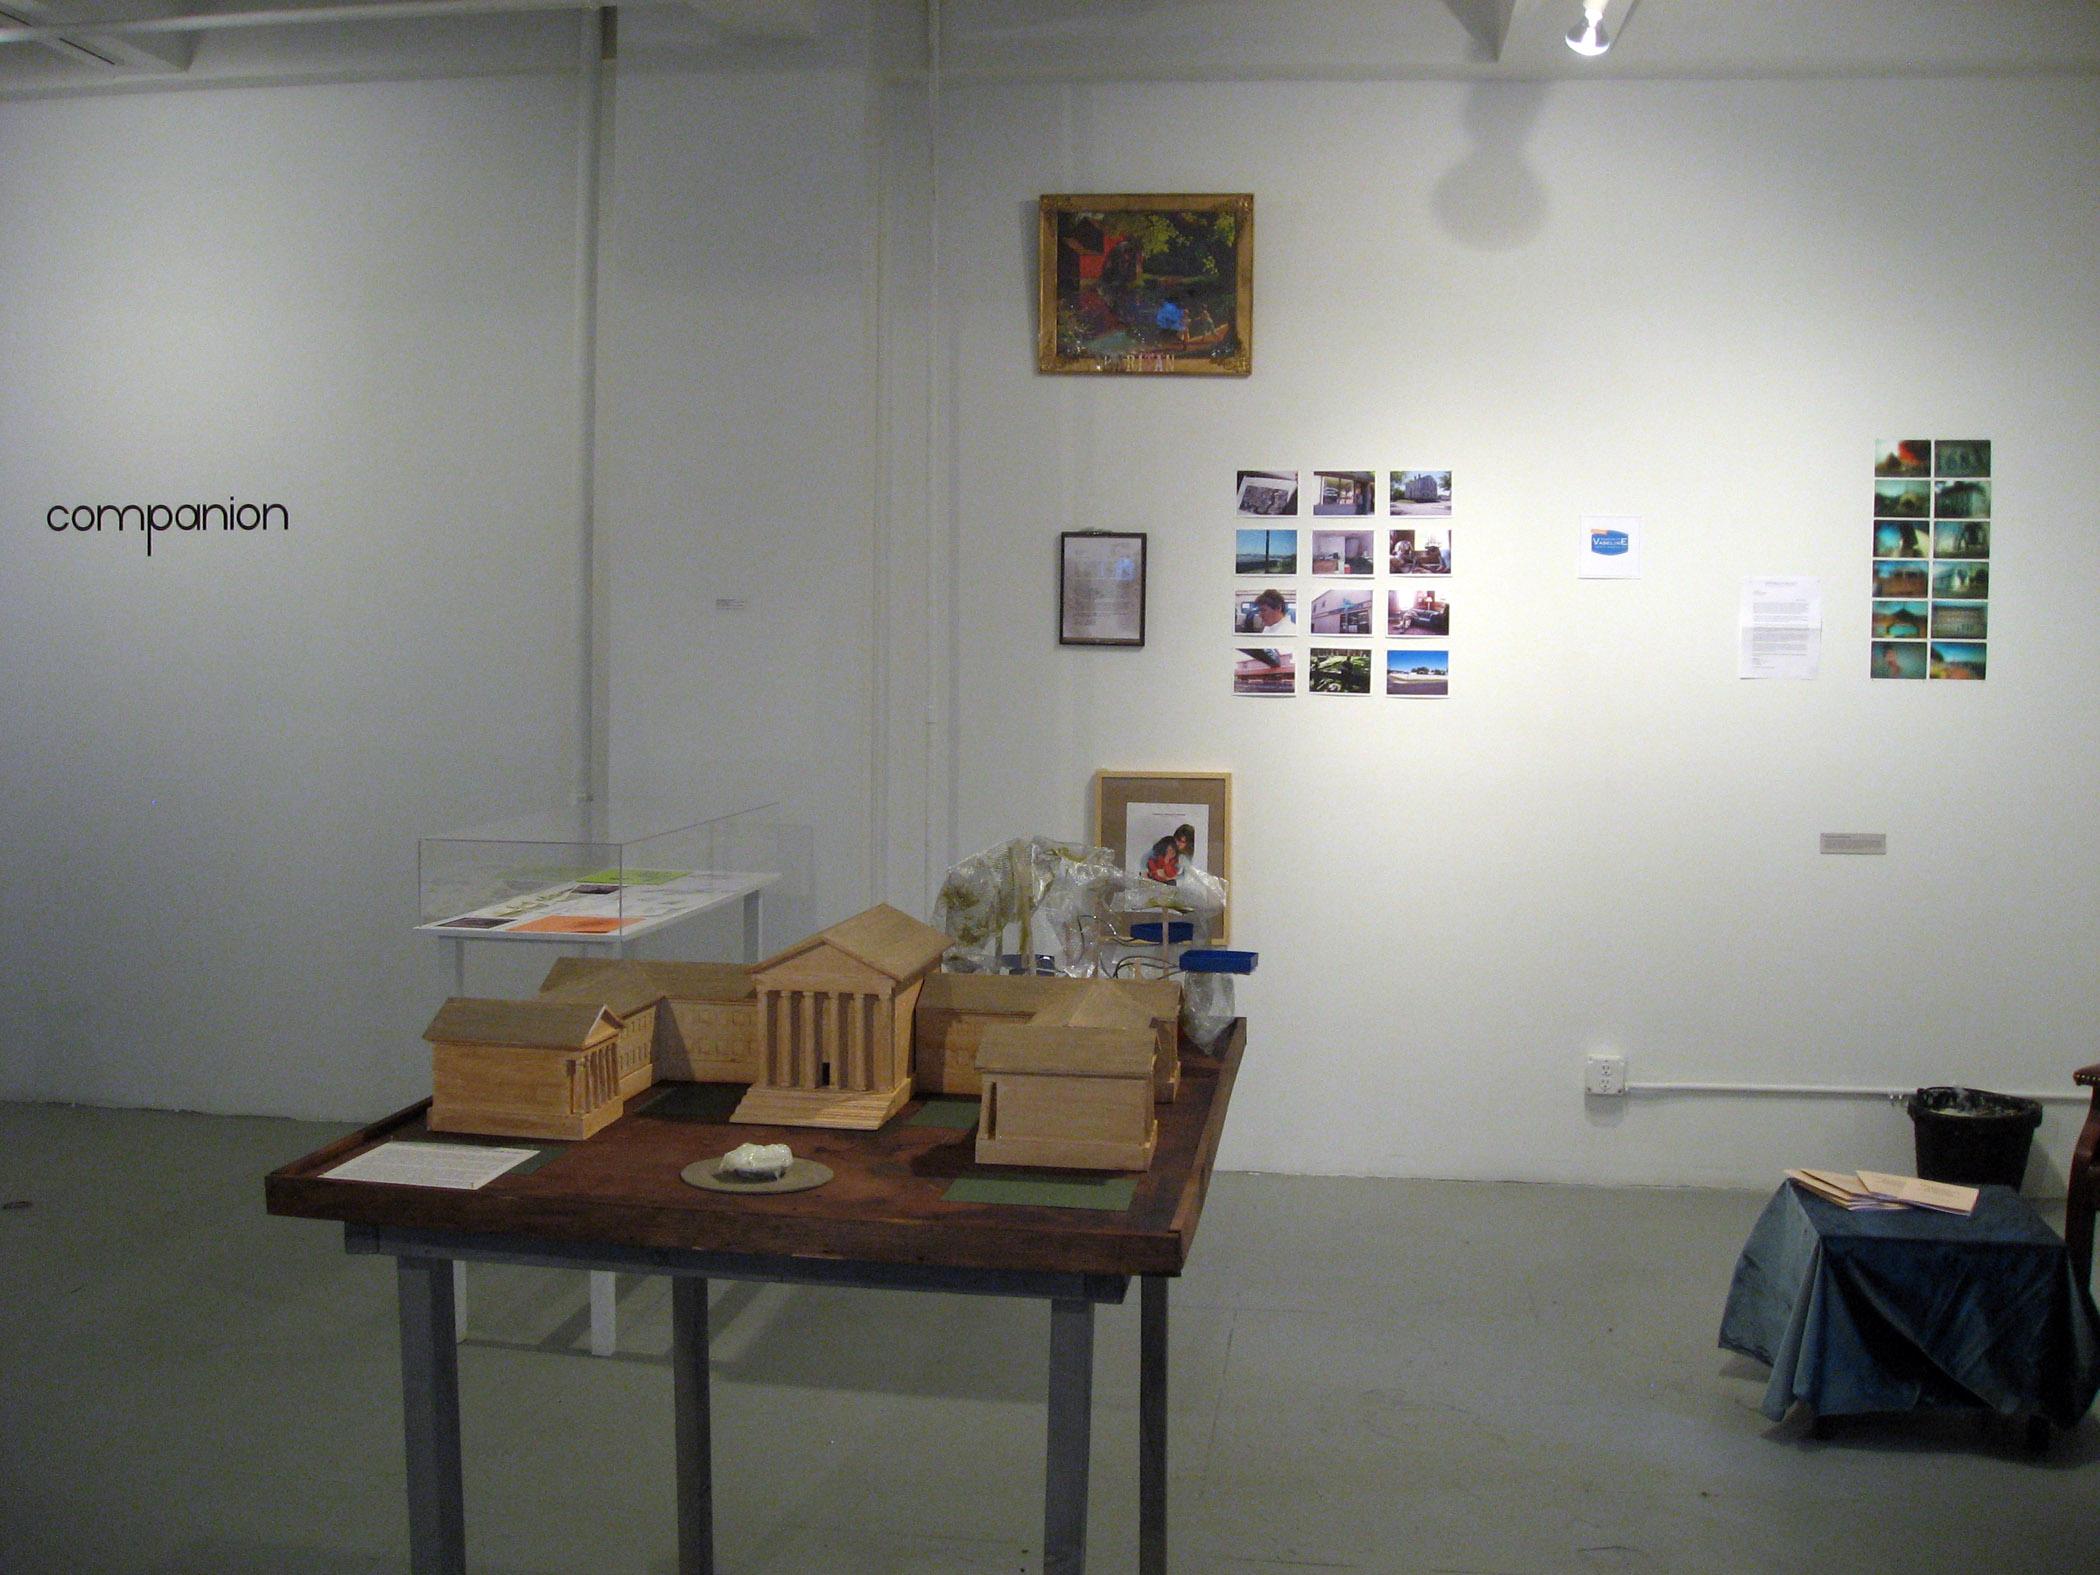 Installation view of Companion